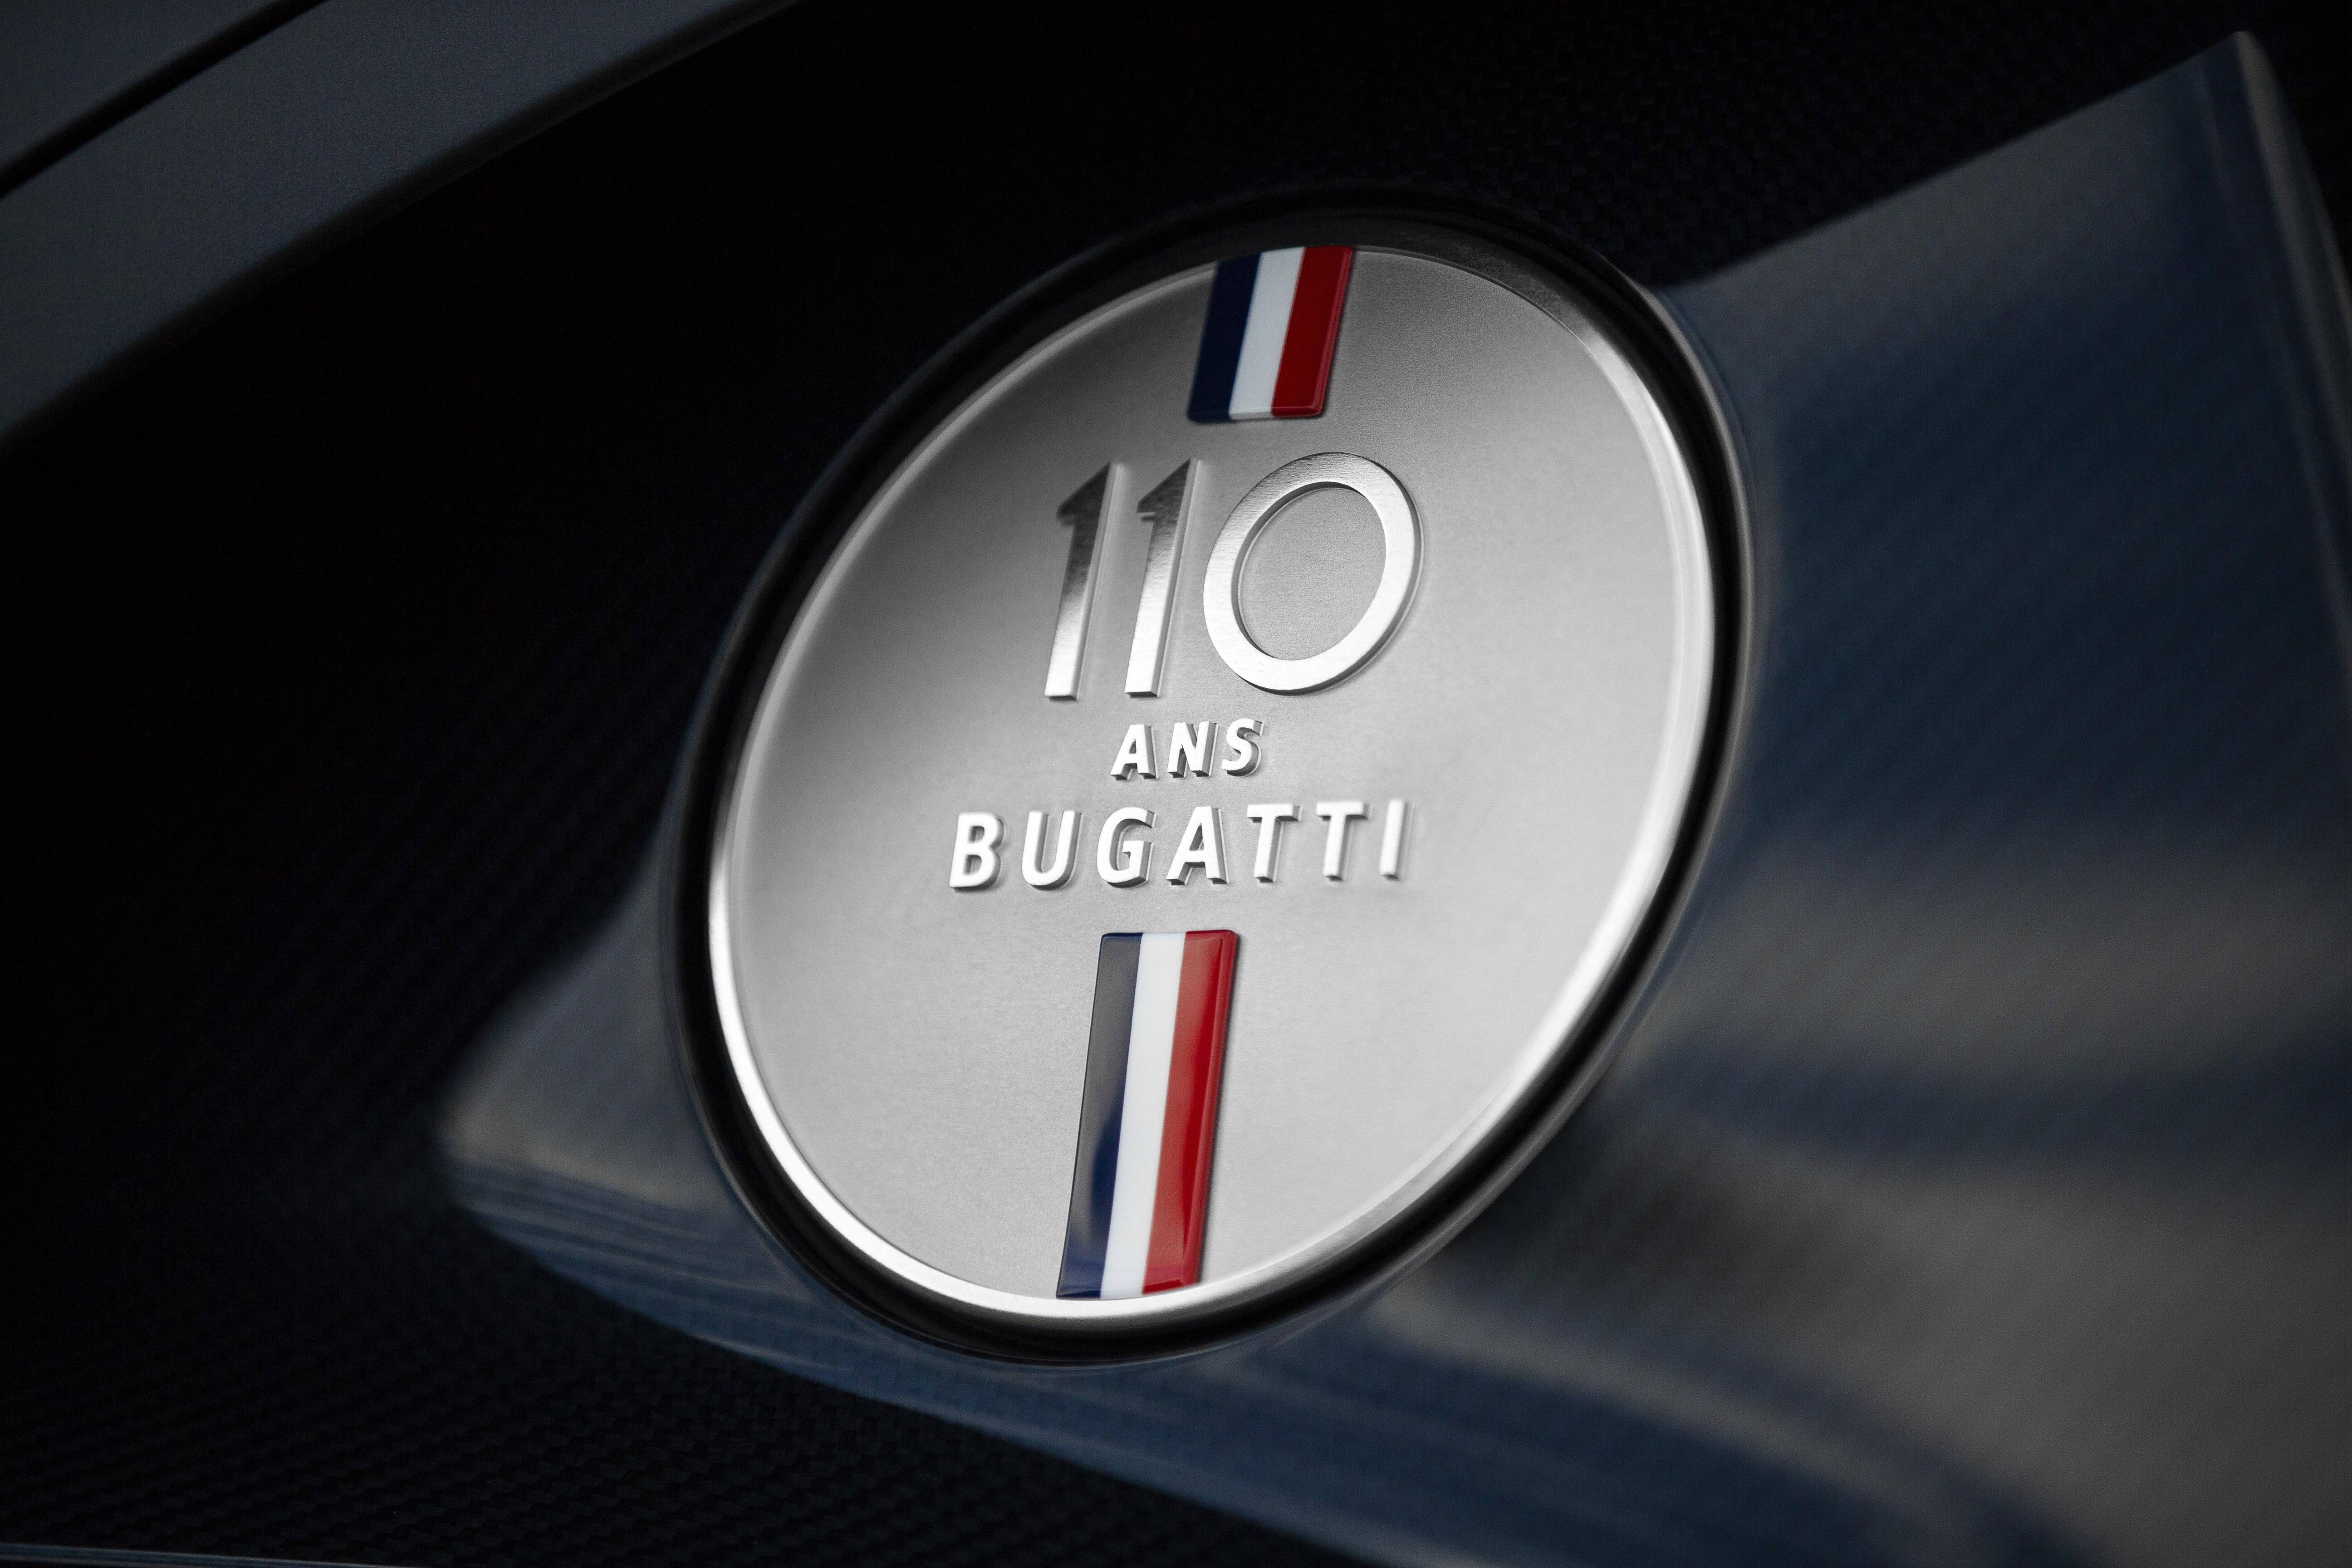 bugatti-chiron-sport-110-ans-bugatti-3.jpg